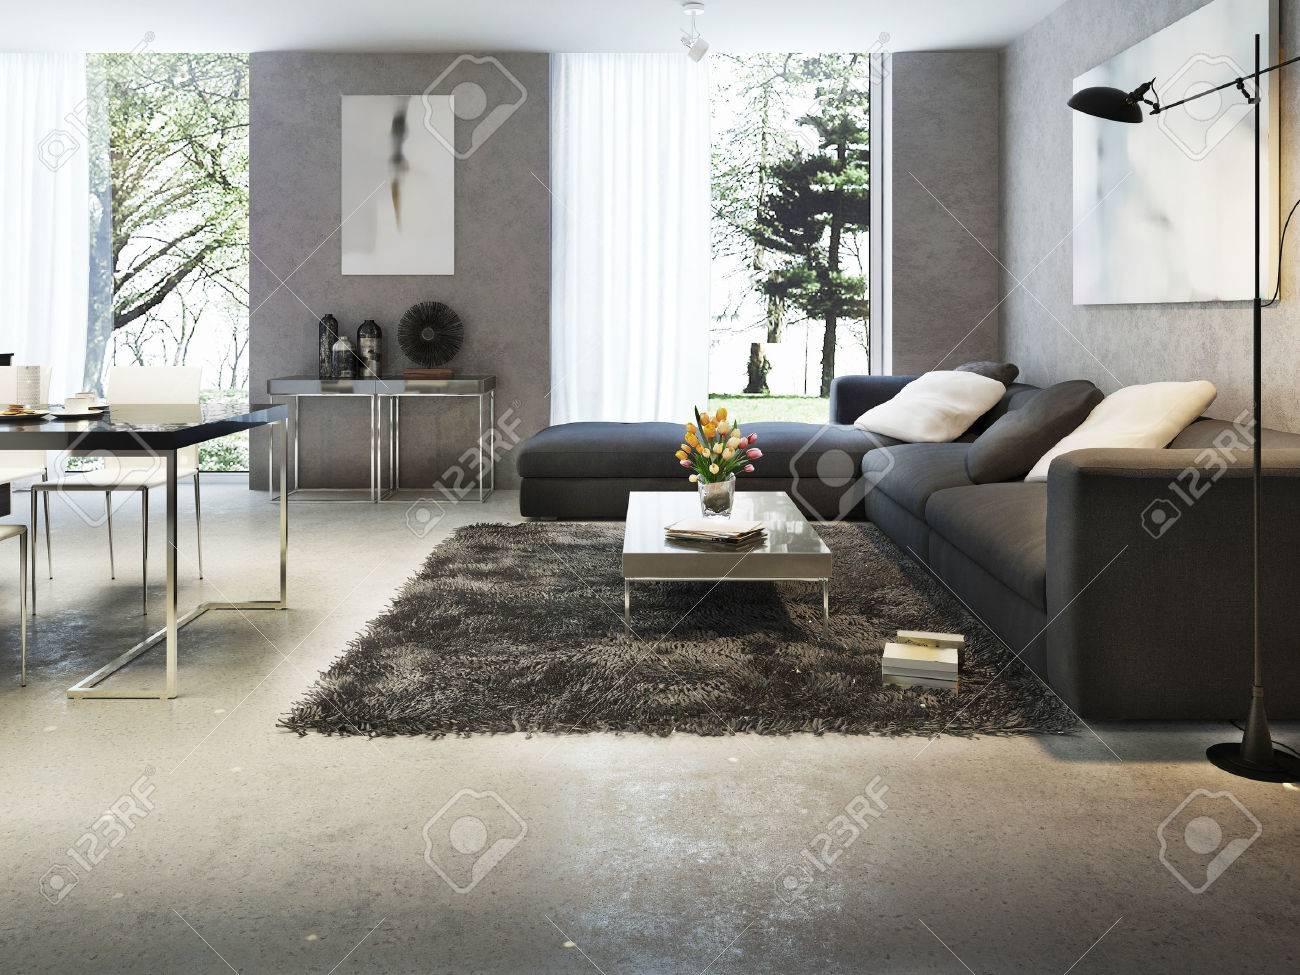 Interni Moderni Ville : Ville interni moderni. affordable progetti di case moderne interni